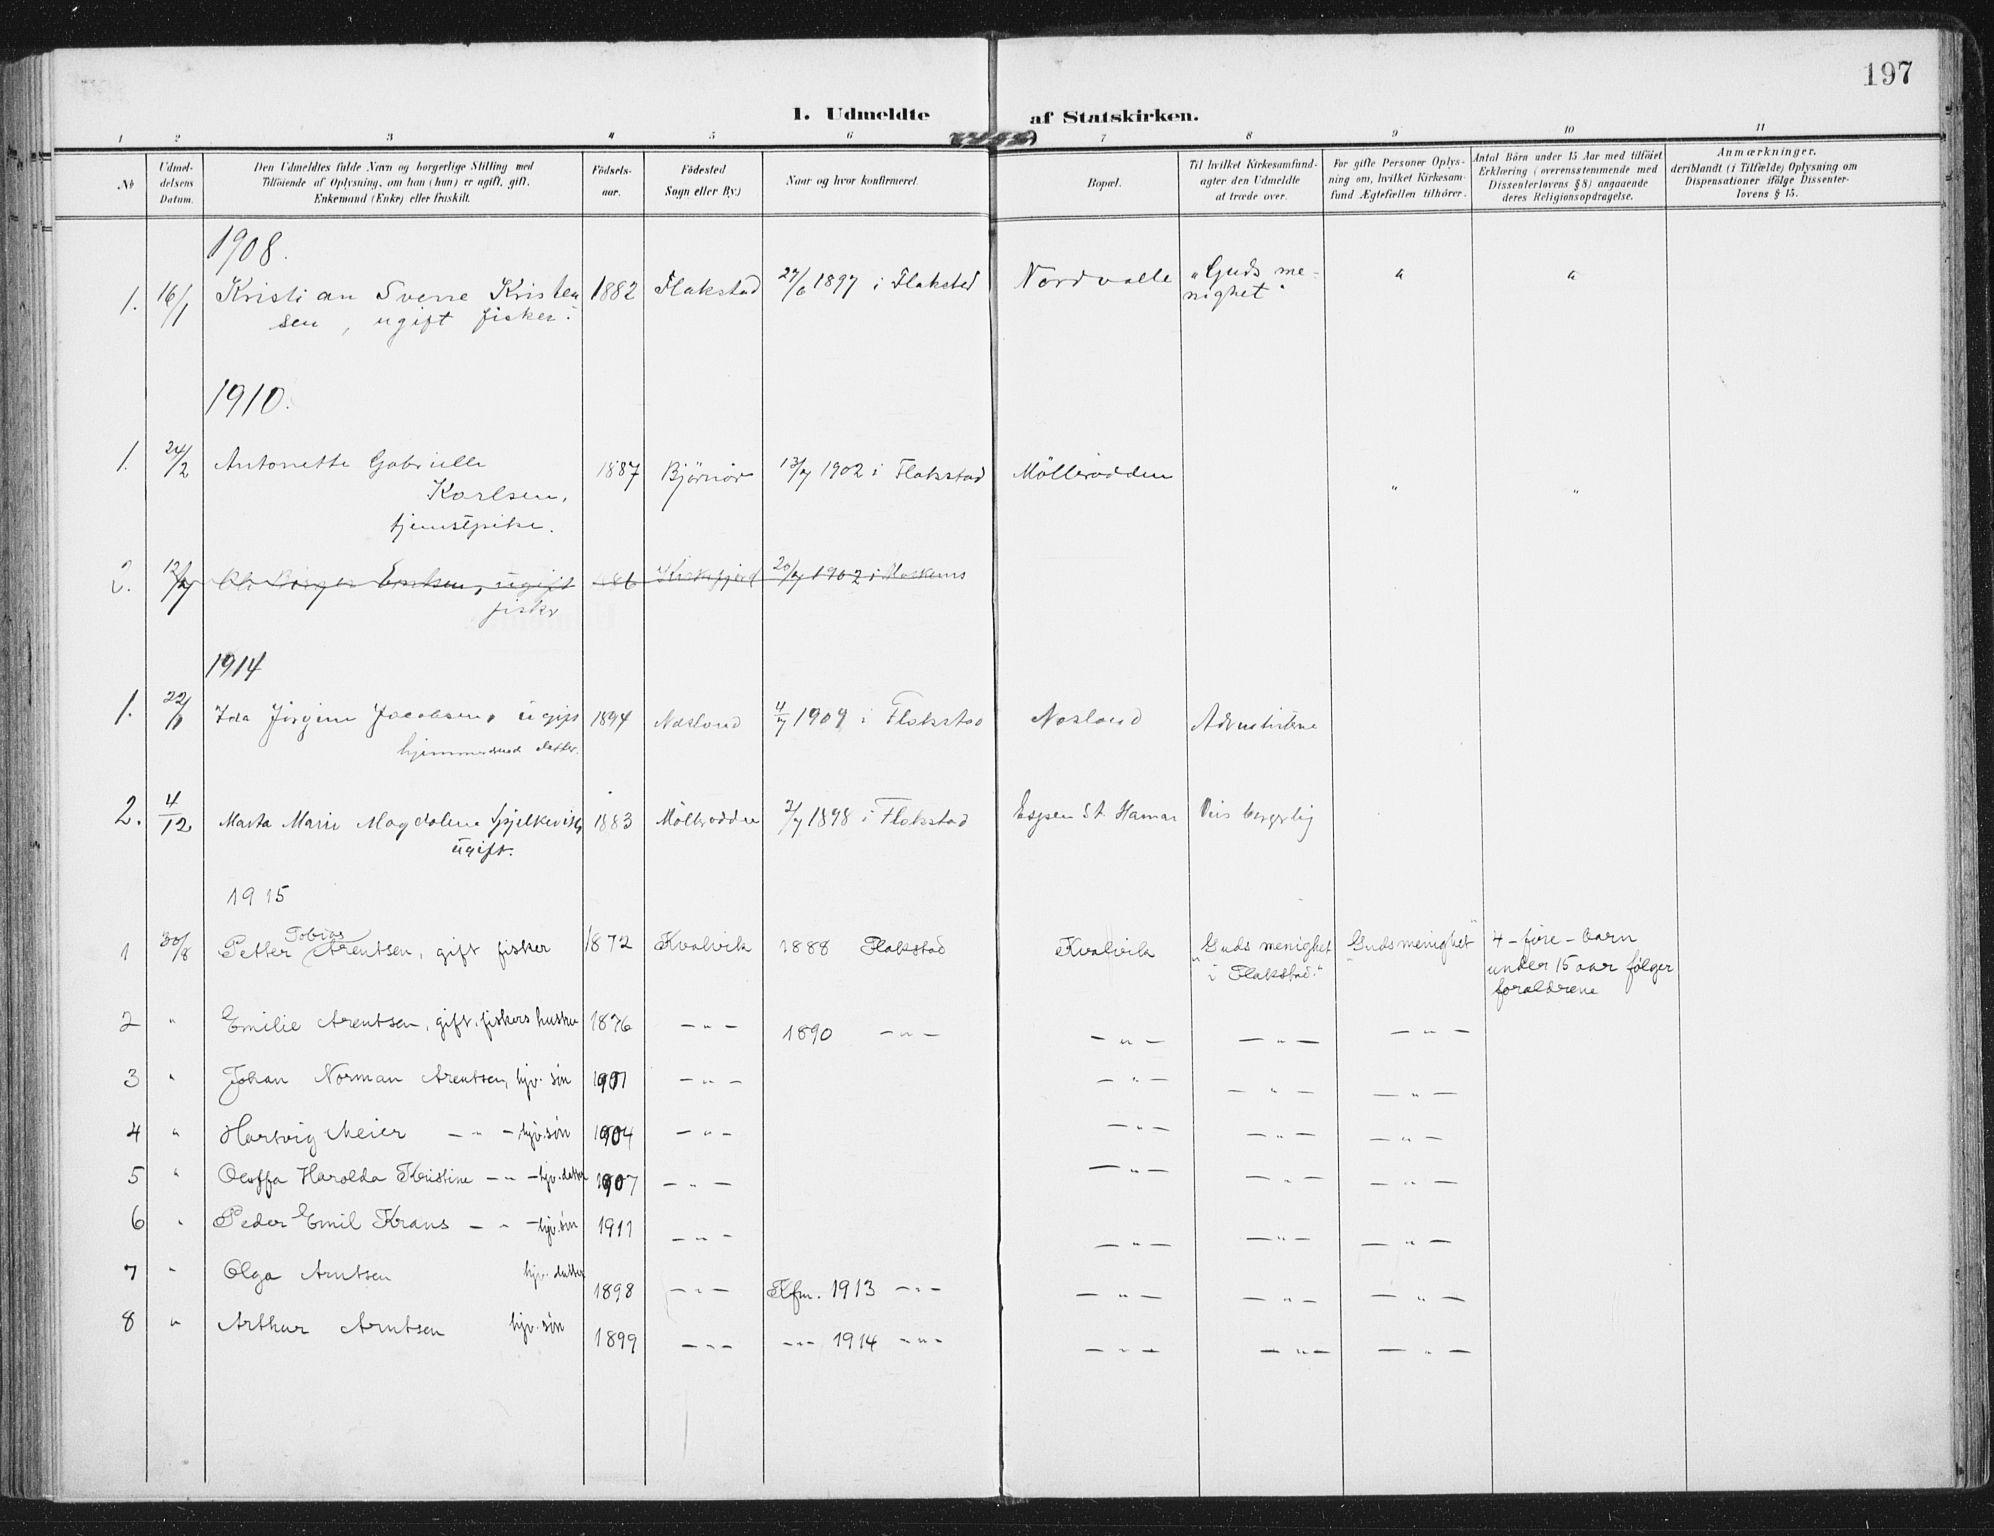 SAT, Ministerialprotokoller, klokkerbøker og fødselsregistre - Nordland, 885/L1206: Ministerialbok nr. 885A07, 1905-1915, s. 197